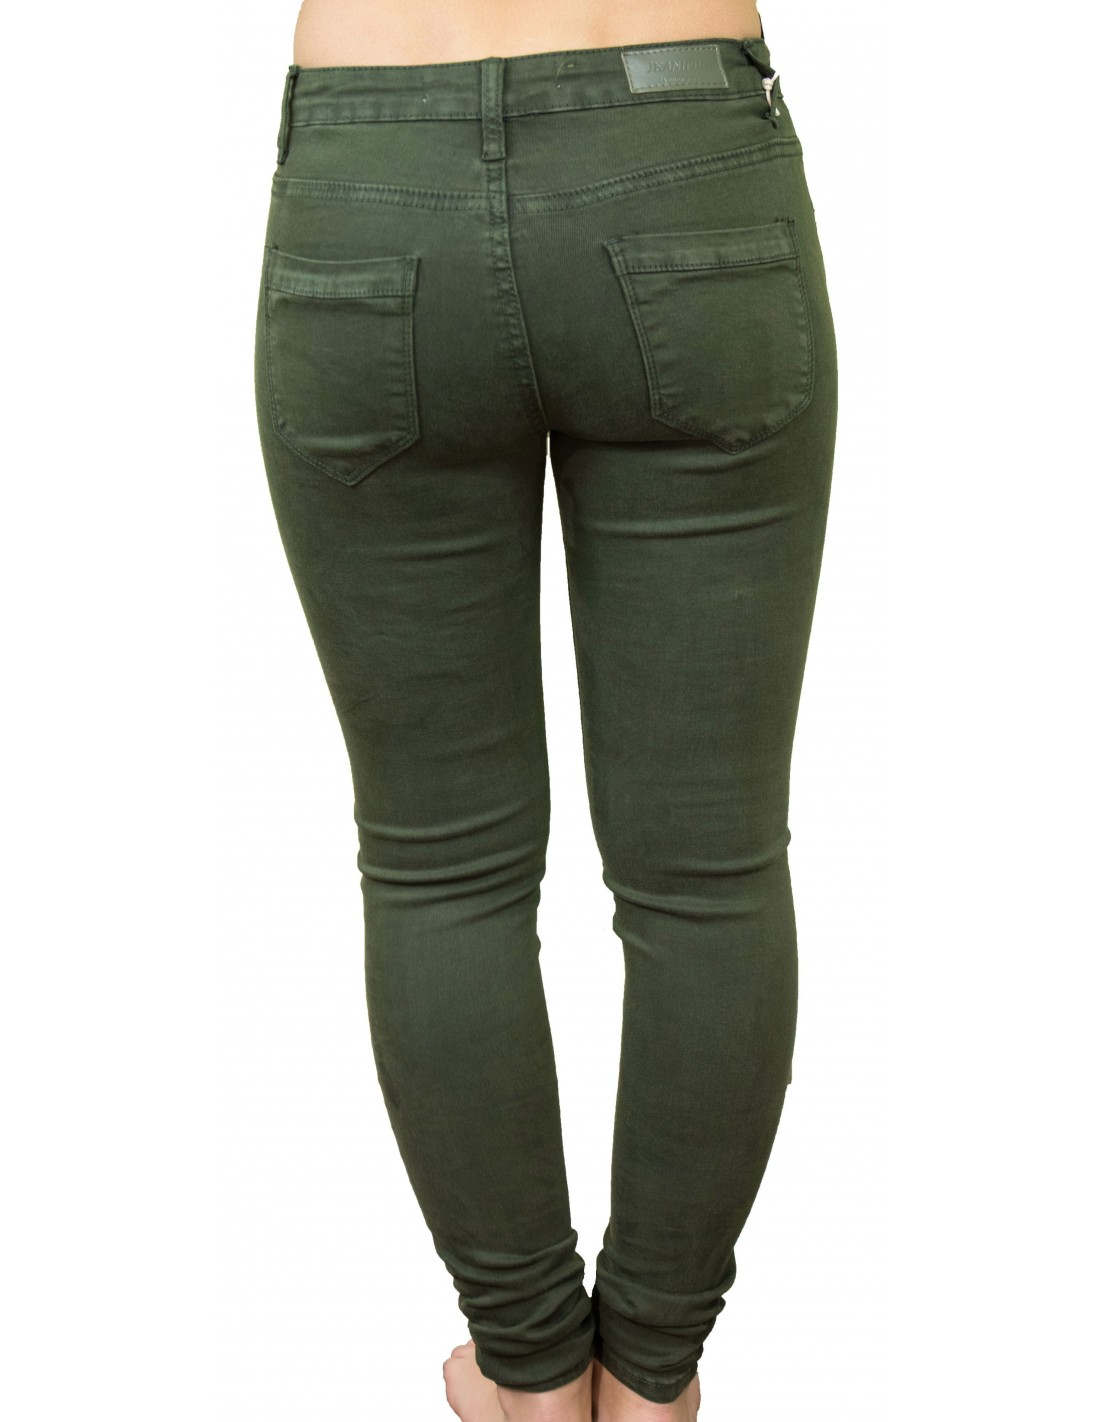 a907c2e50c29 jean femme vert kaki